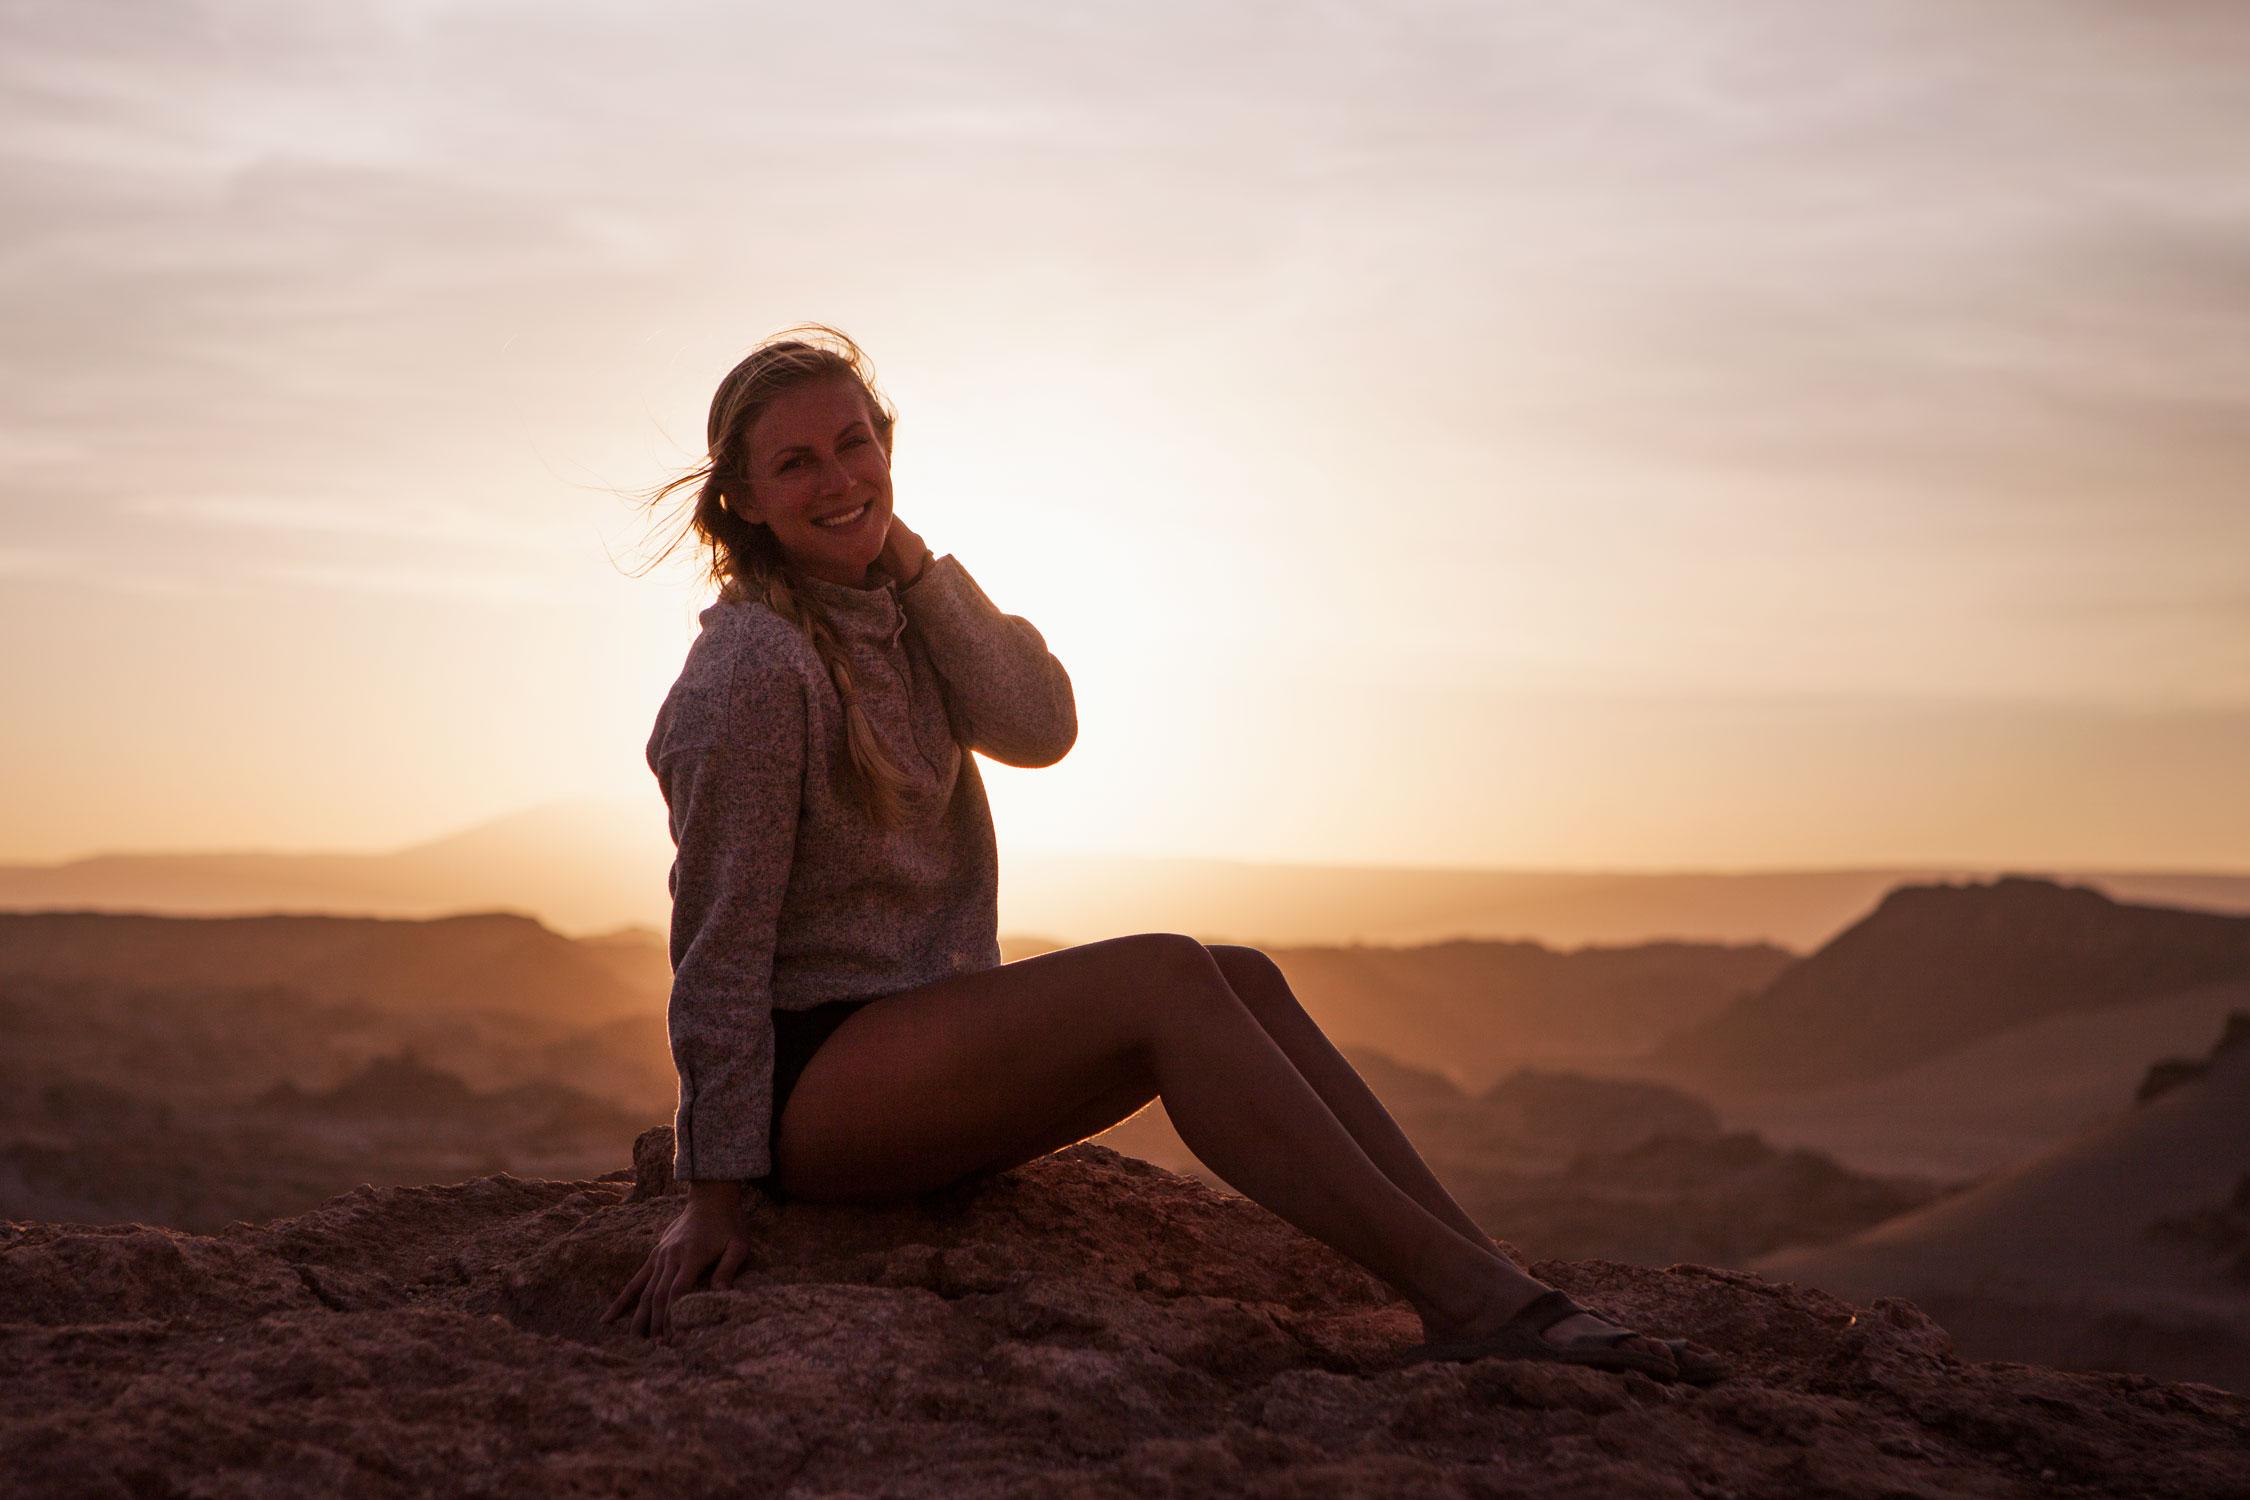 atacama-desert-chile-wander-south-valle-de-luna-sunset-meg-3.jpg